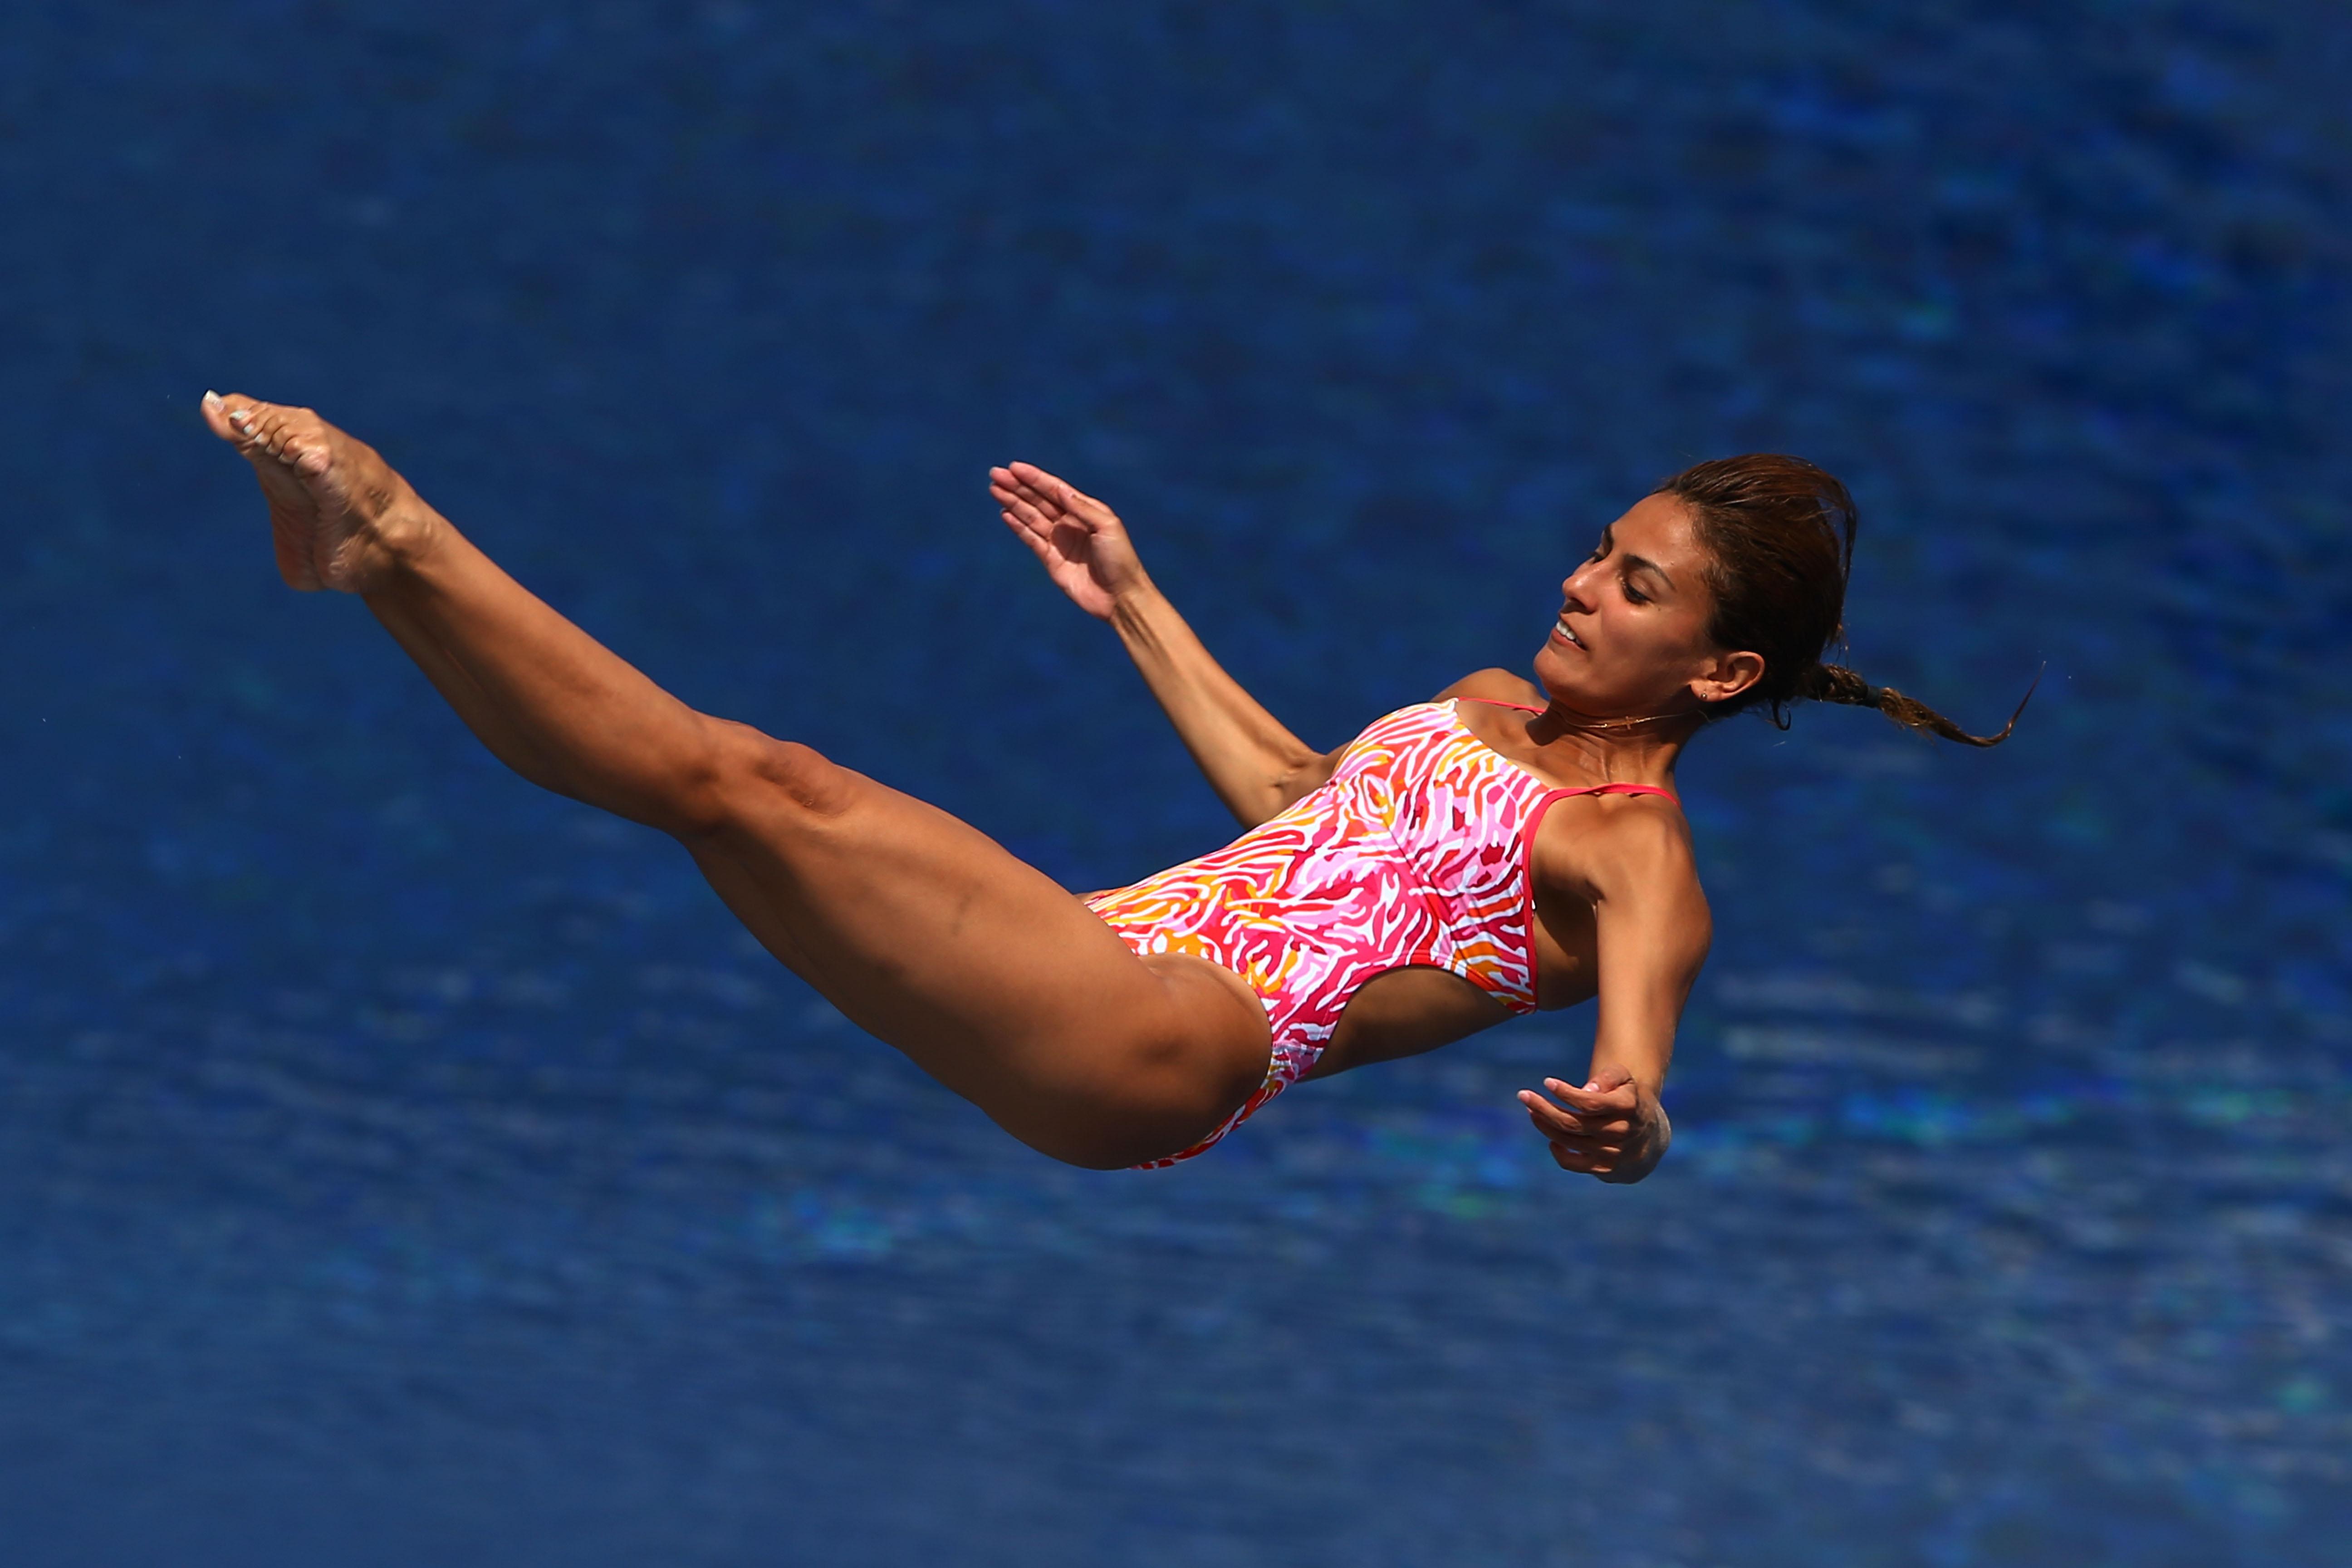 Paola Espinosa, Atleta, Clavados, Olímpicos, Medallista, Campeona